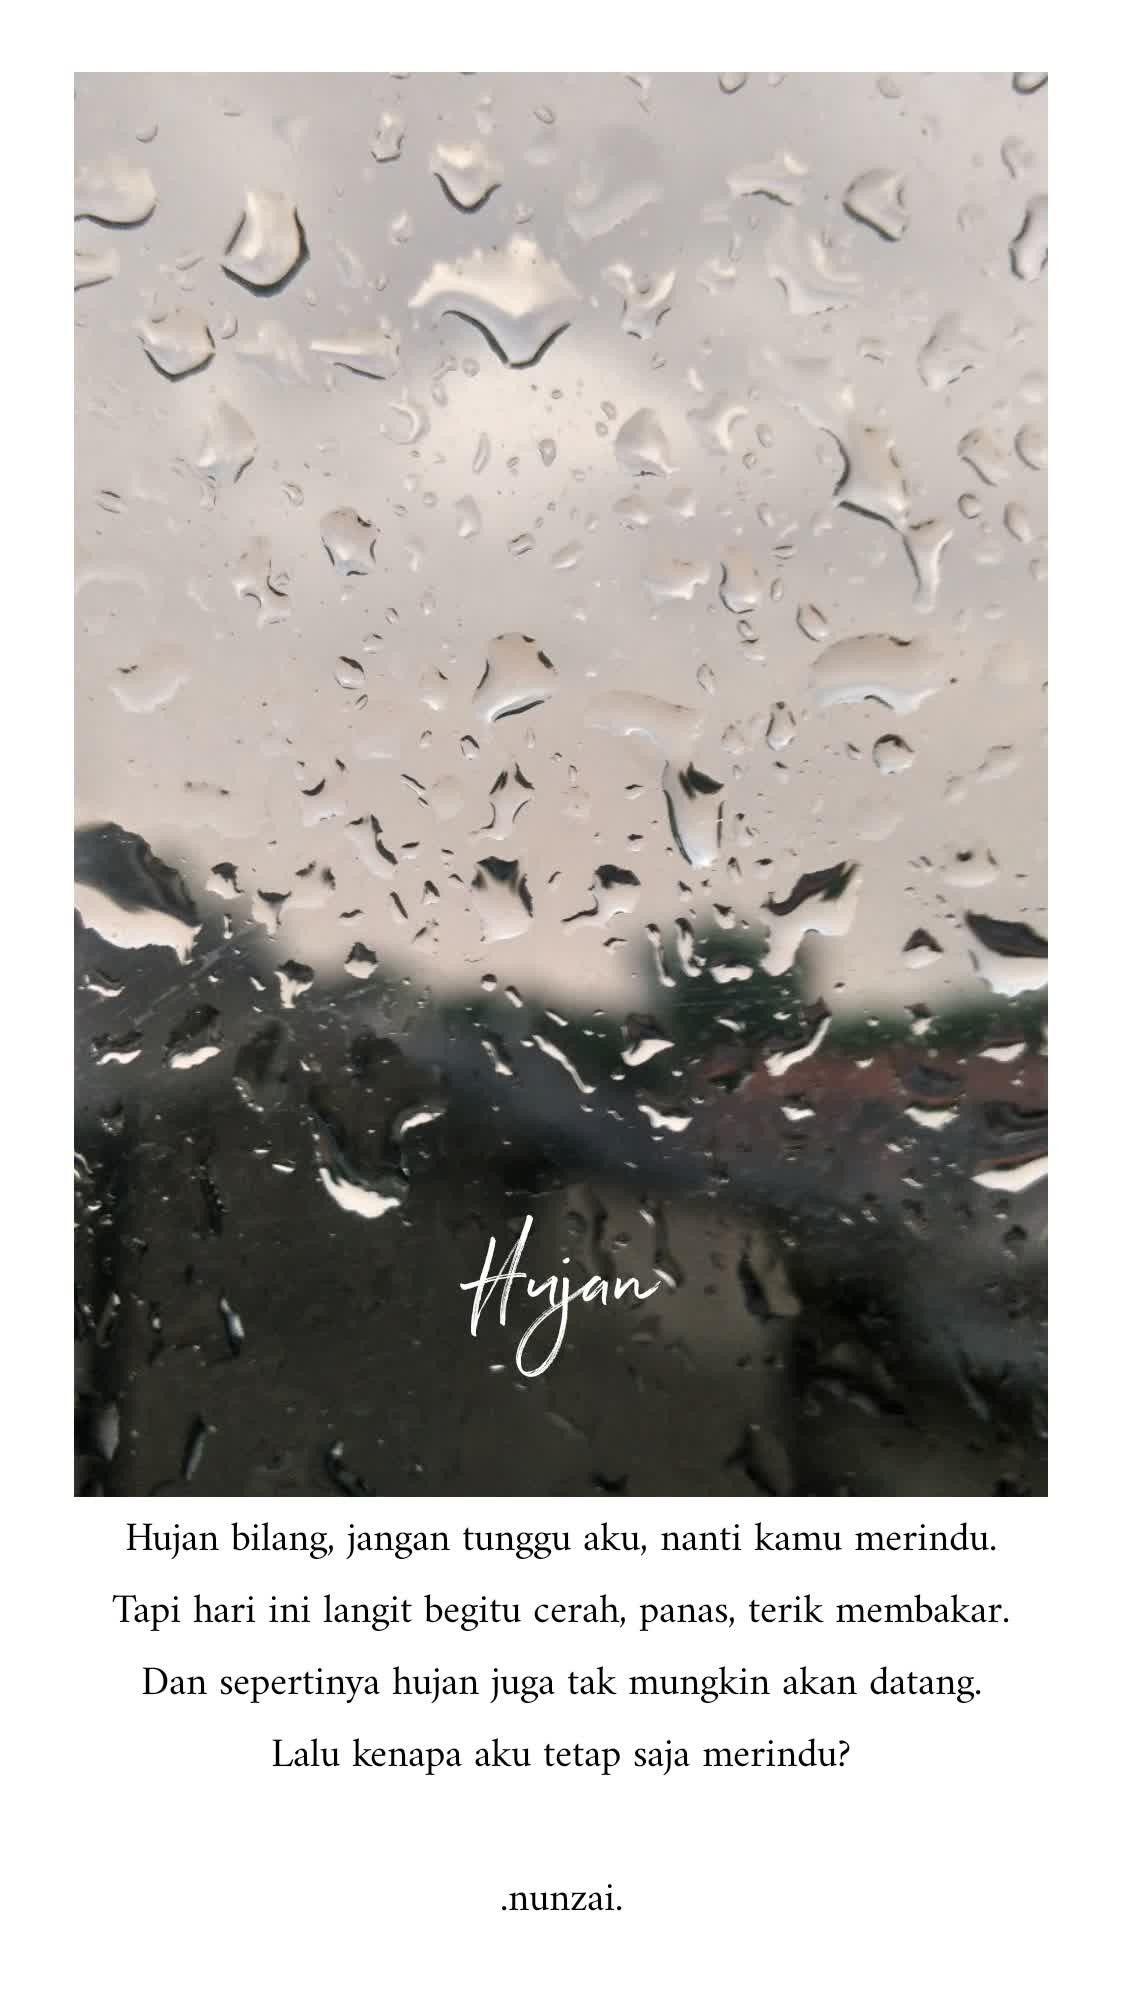 pin oleh 𝓪𝓶𝓮𝔂 di kata kutipan buku kutipan terbaik hujan